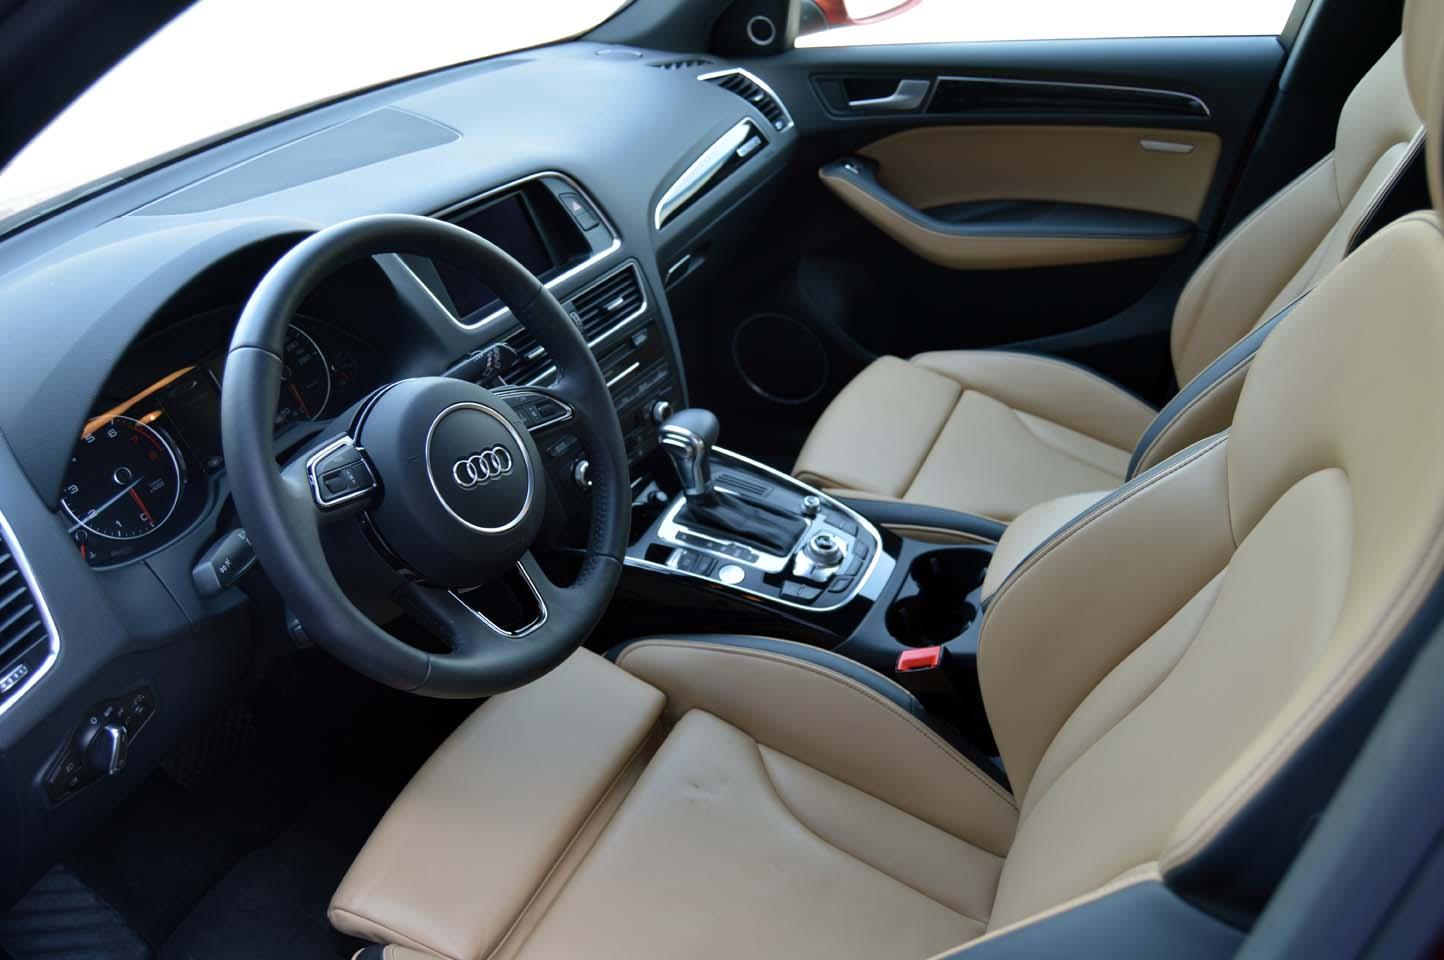 Audi Q5 2014 Review: As big As small | drivemeonline.com